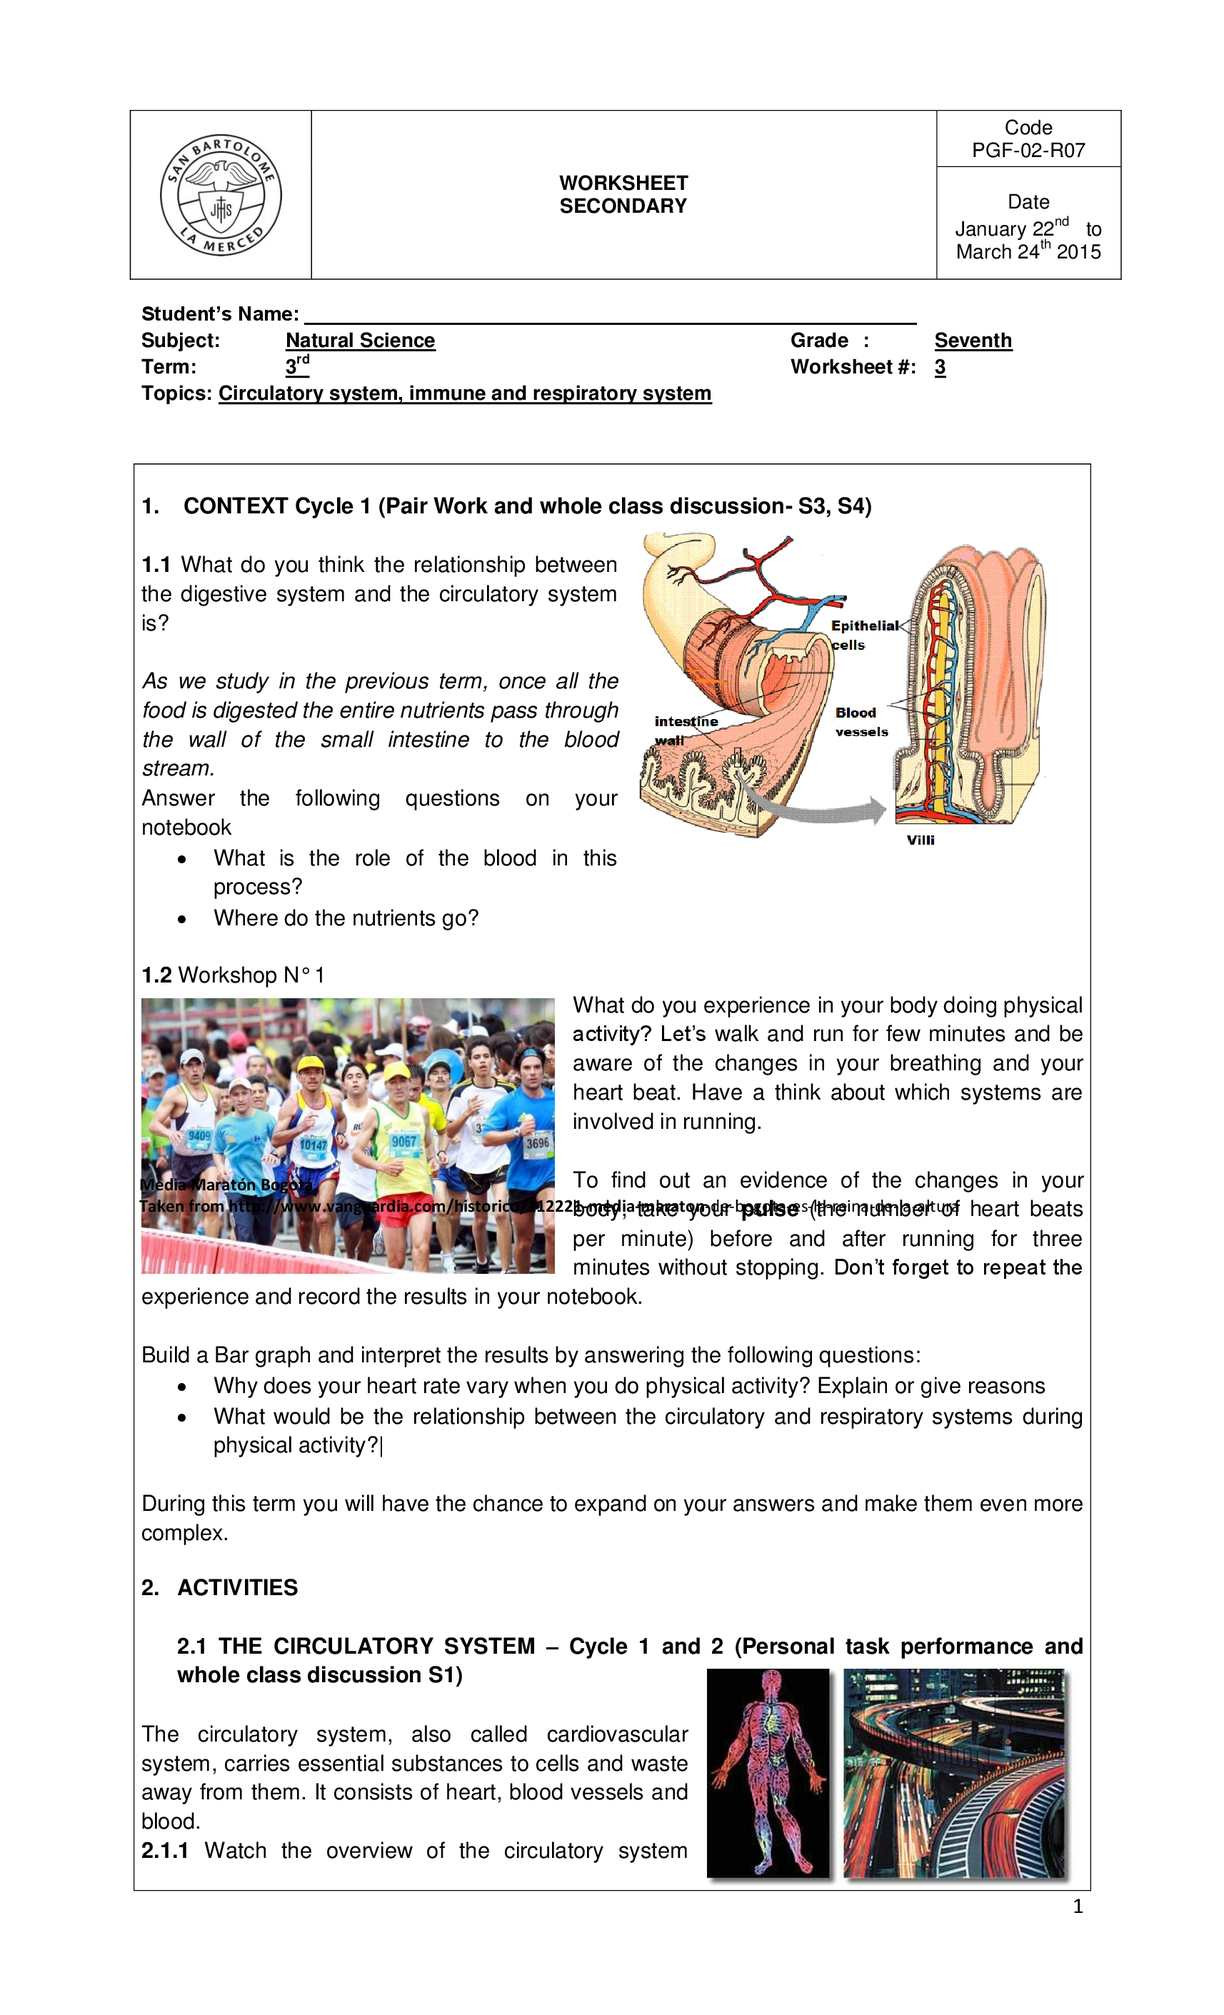 The Circulatory System Worksheet